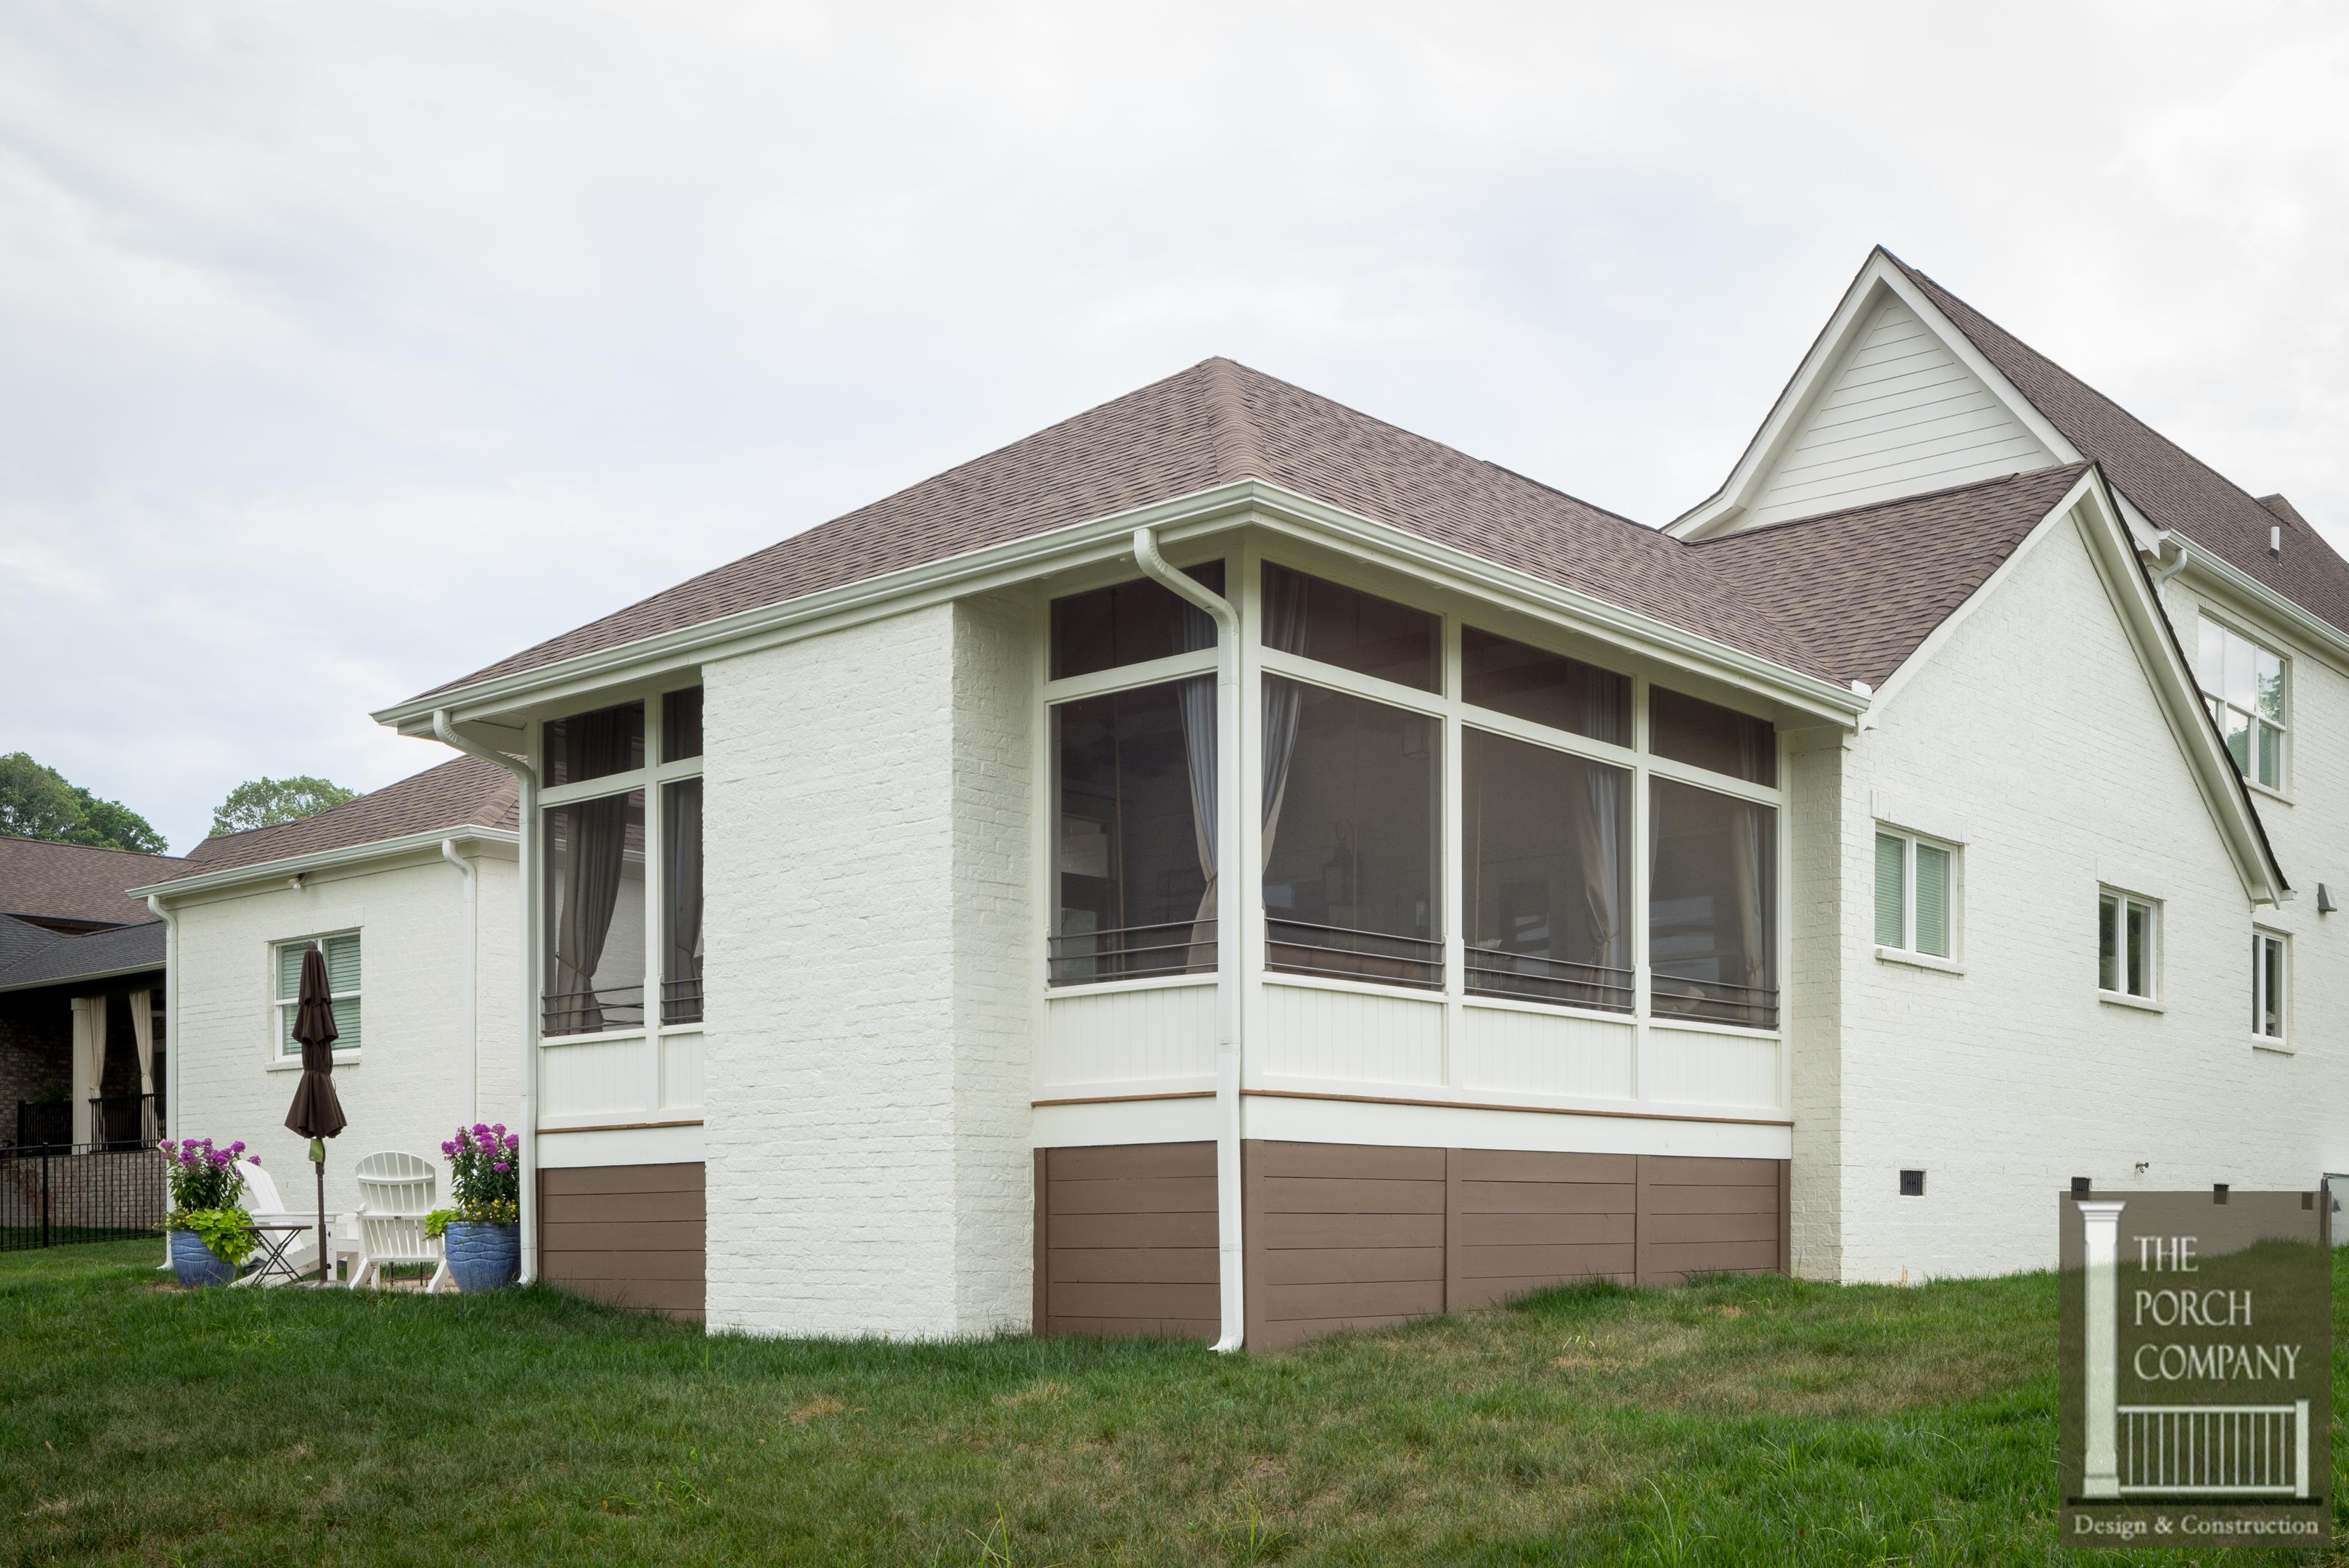 Porch Company Unique Design Features - The Porch CompanyThe Porch ...